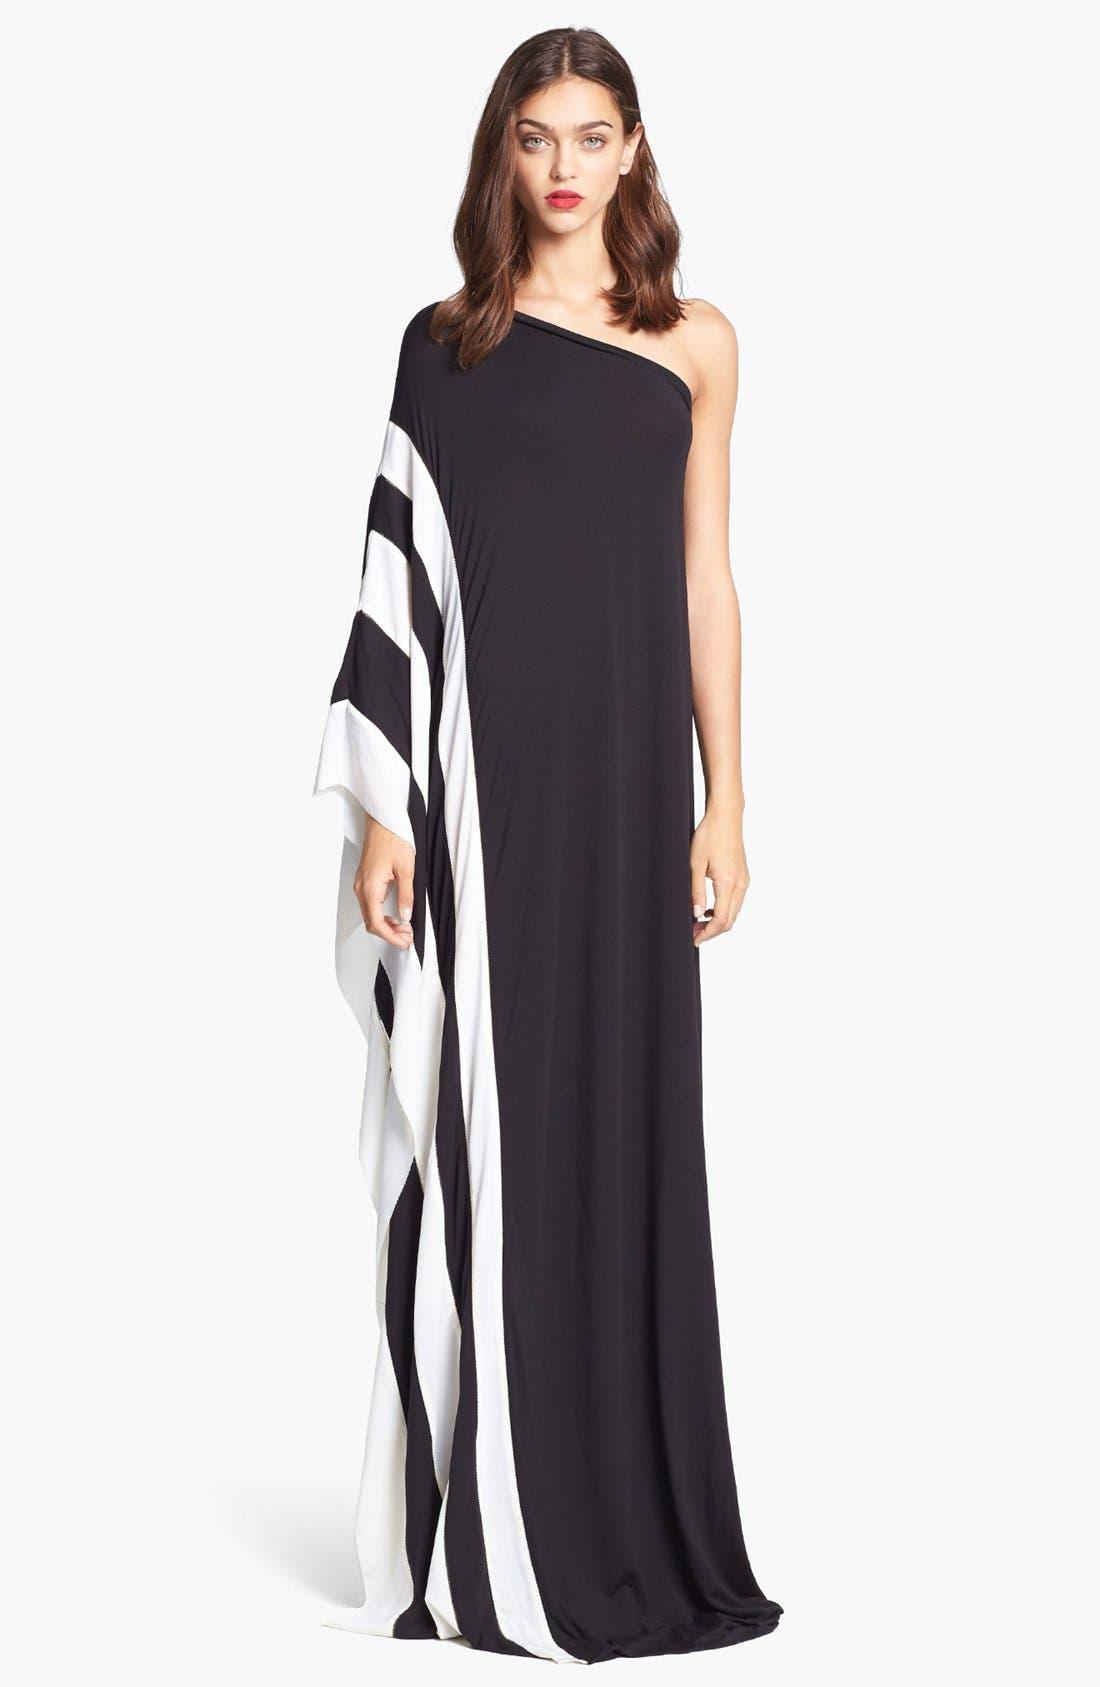 Alternate Image 1 Selected - Rachel Zoe 'Azur' One Shoulder Jersey Maxi Dress